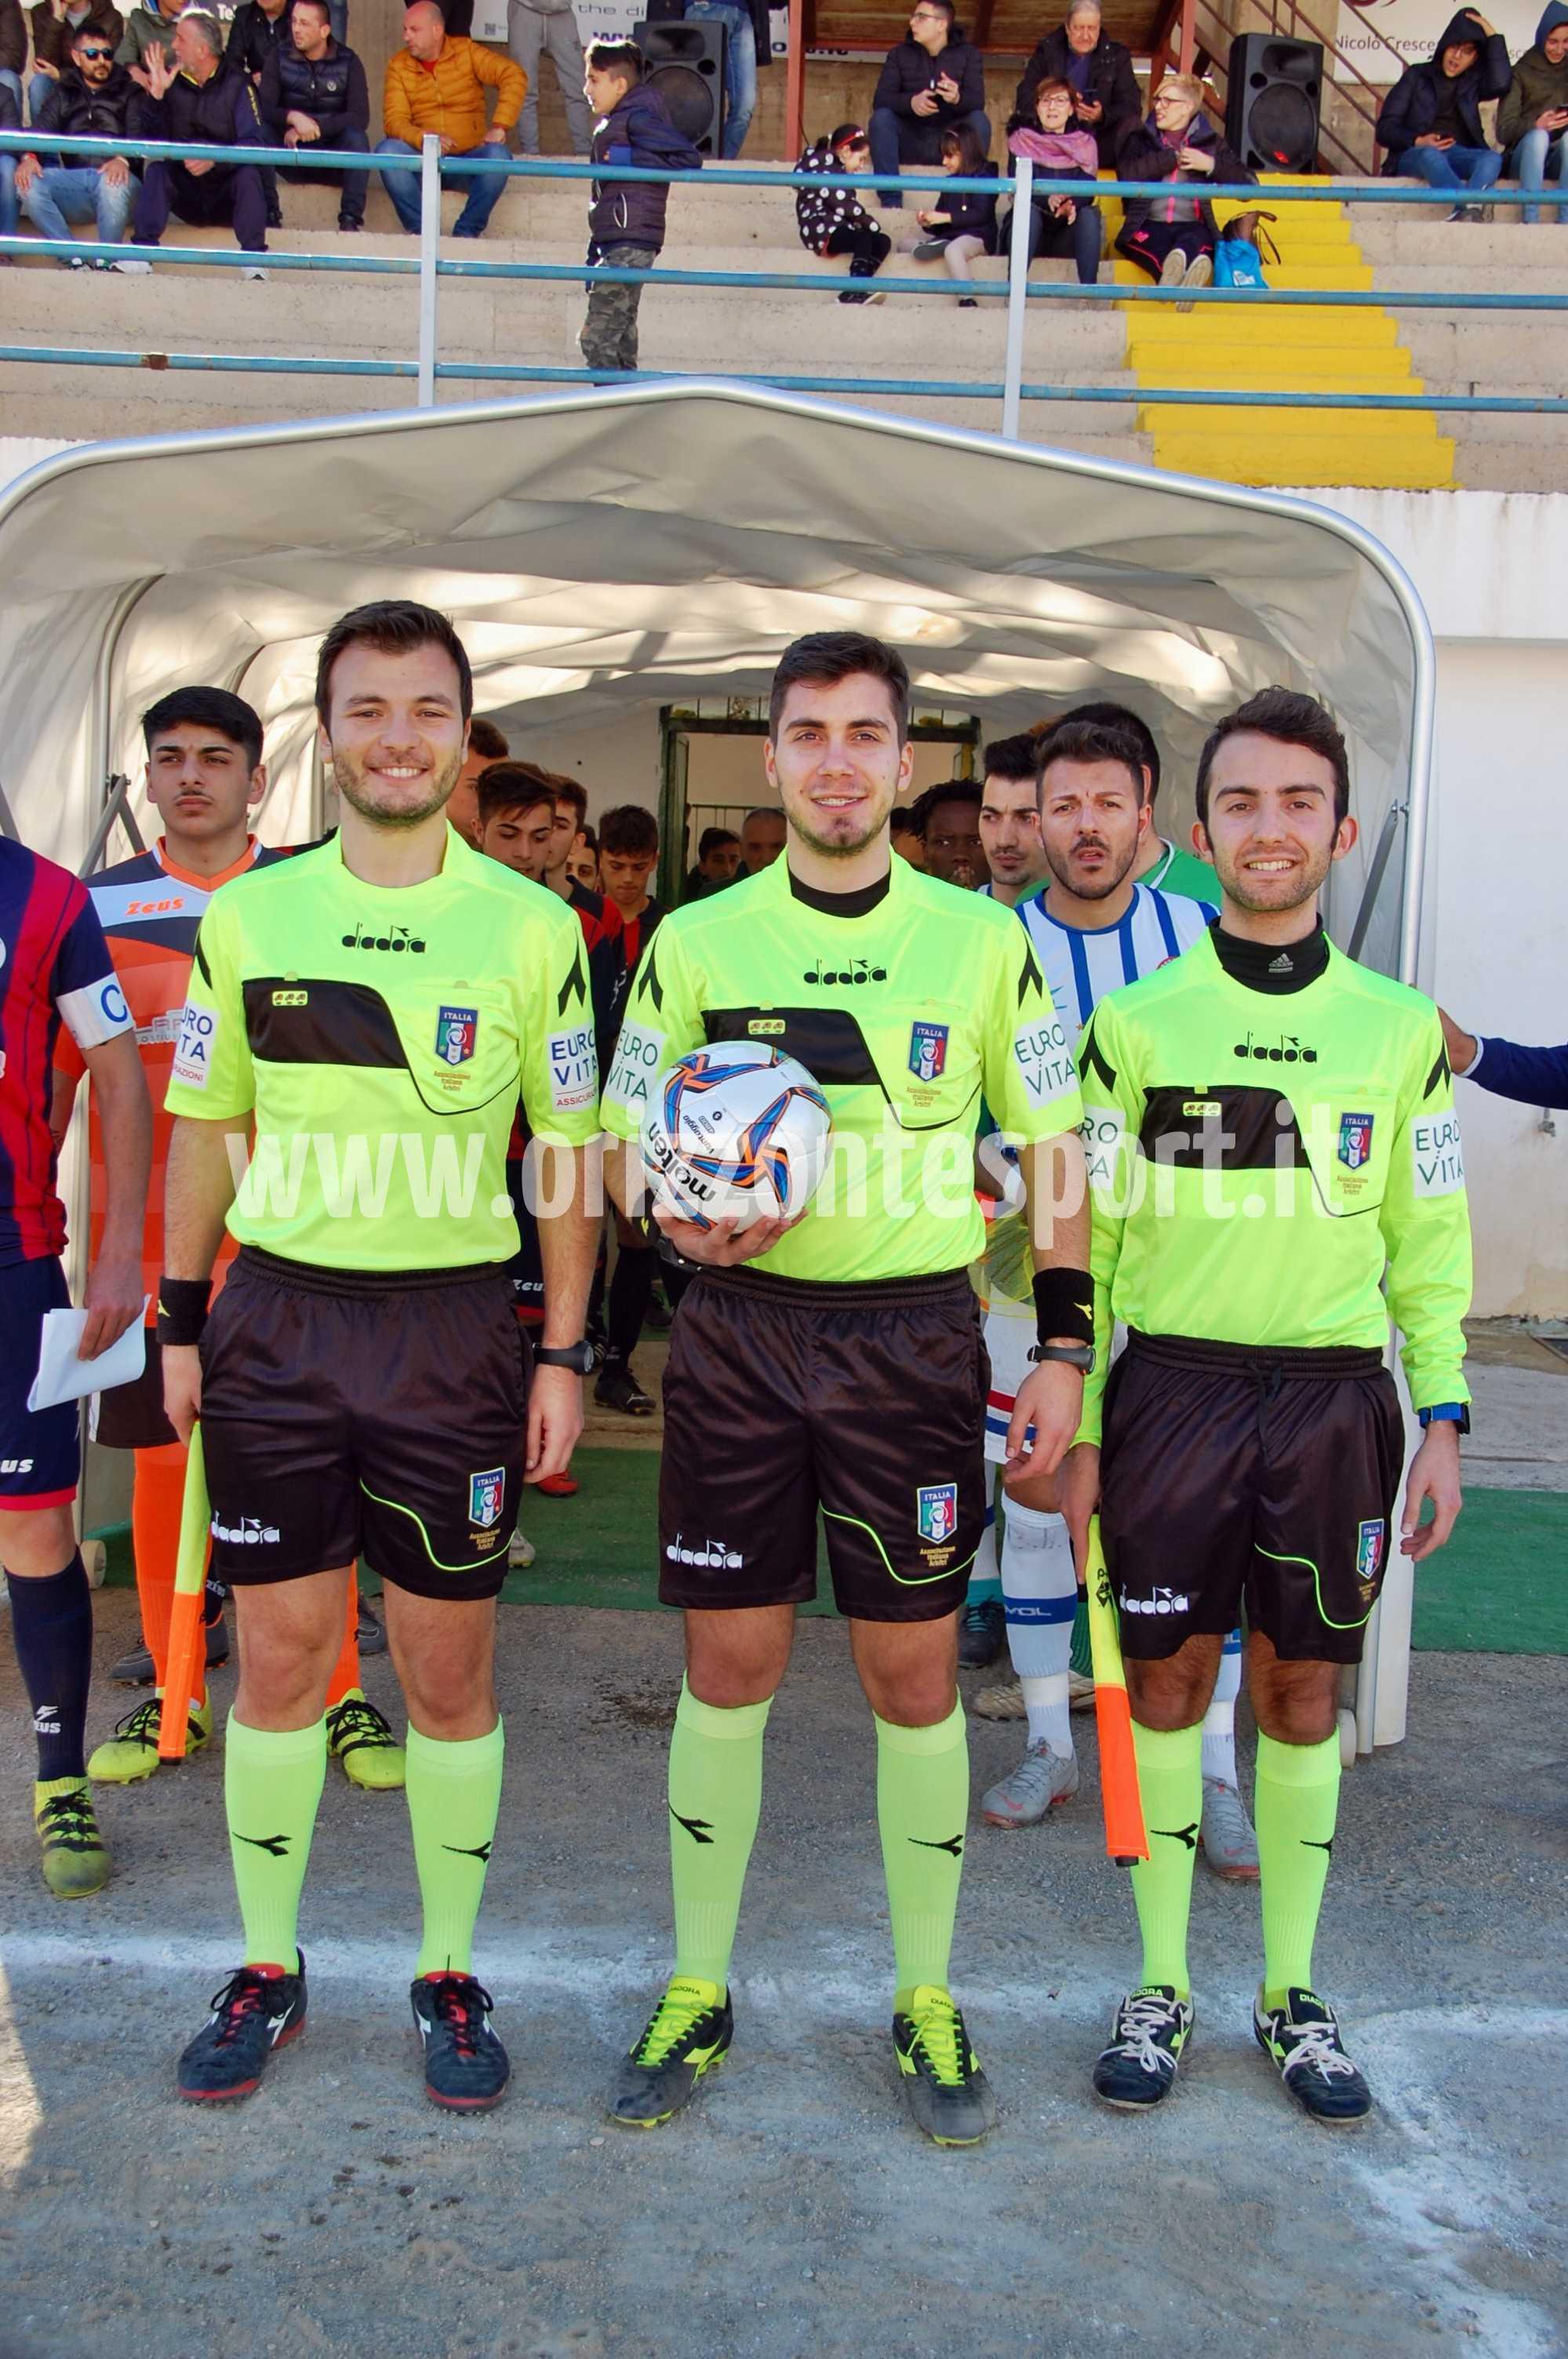 cassano_rossanese (7)